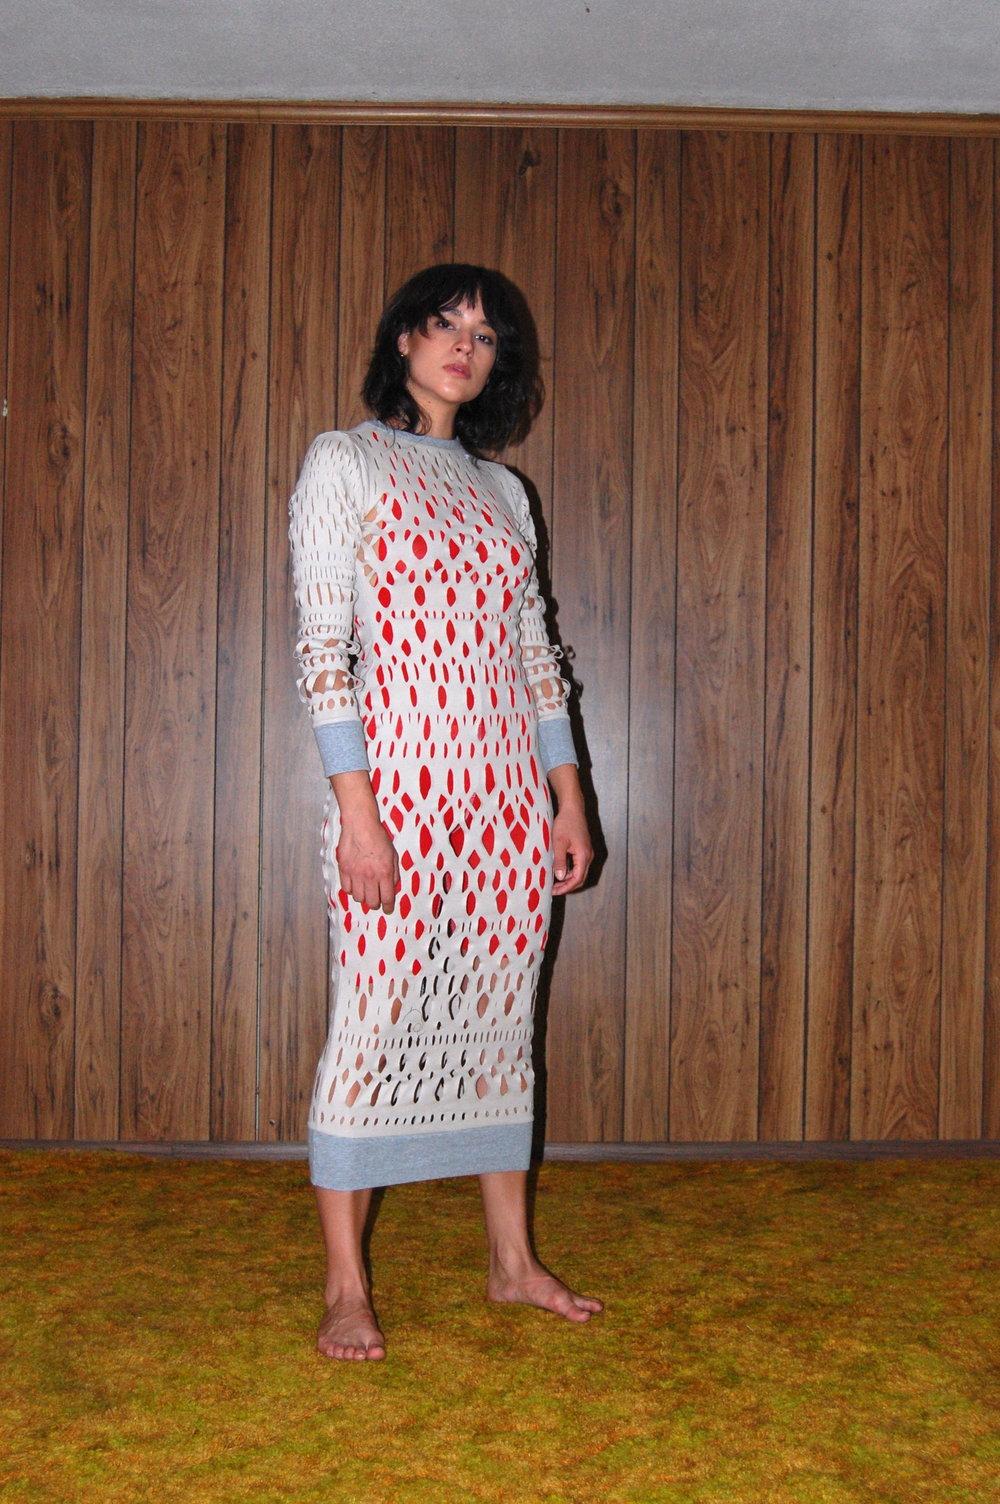 slit dress.JPG